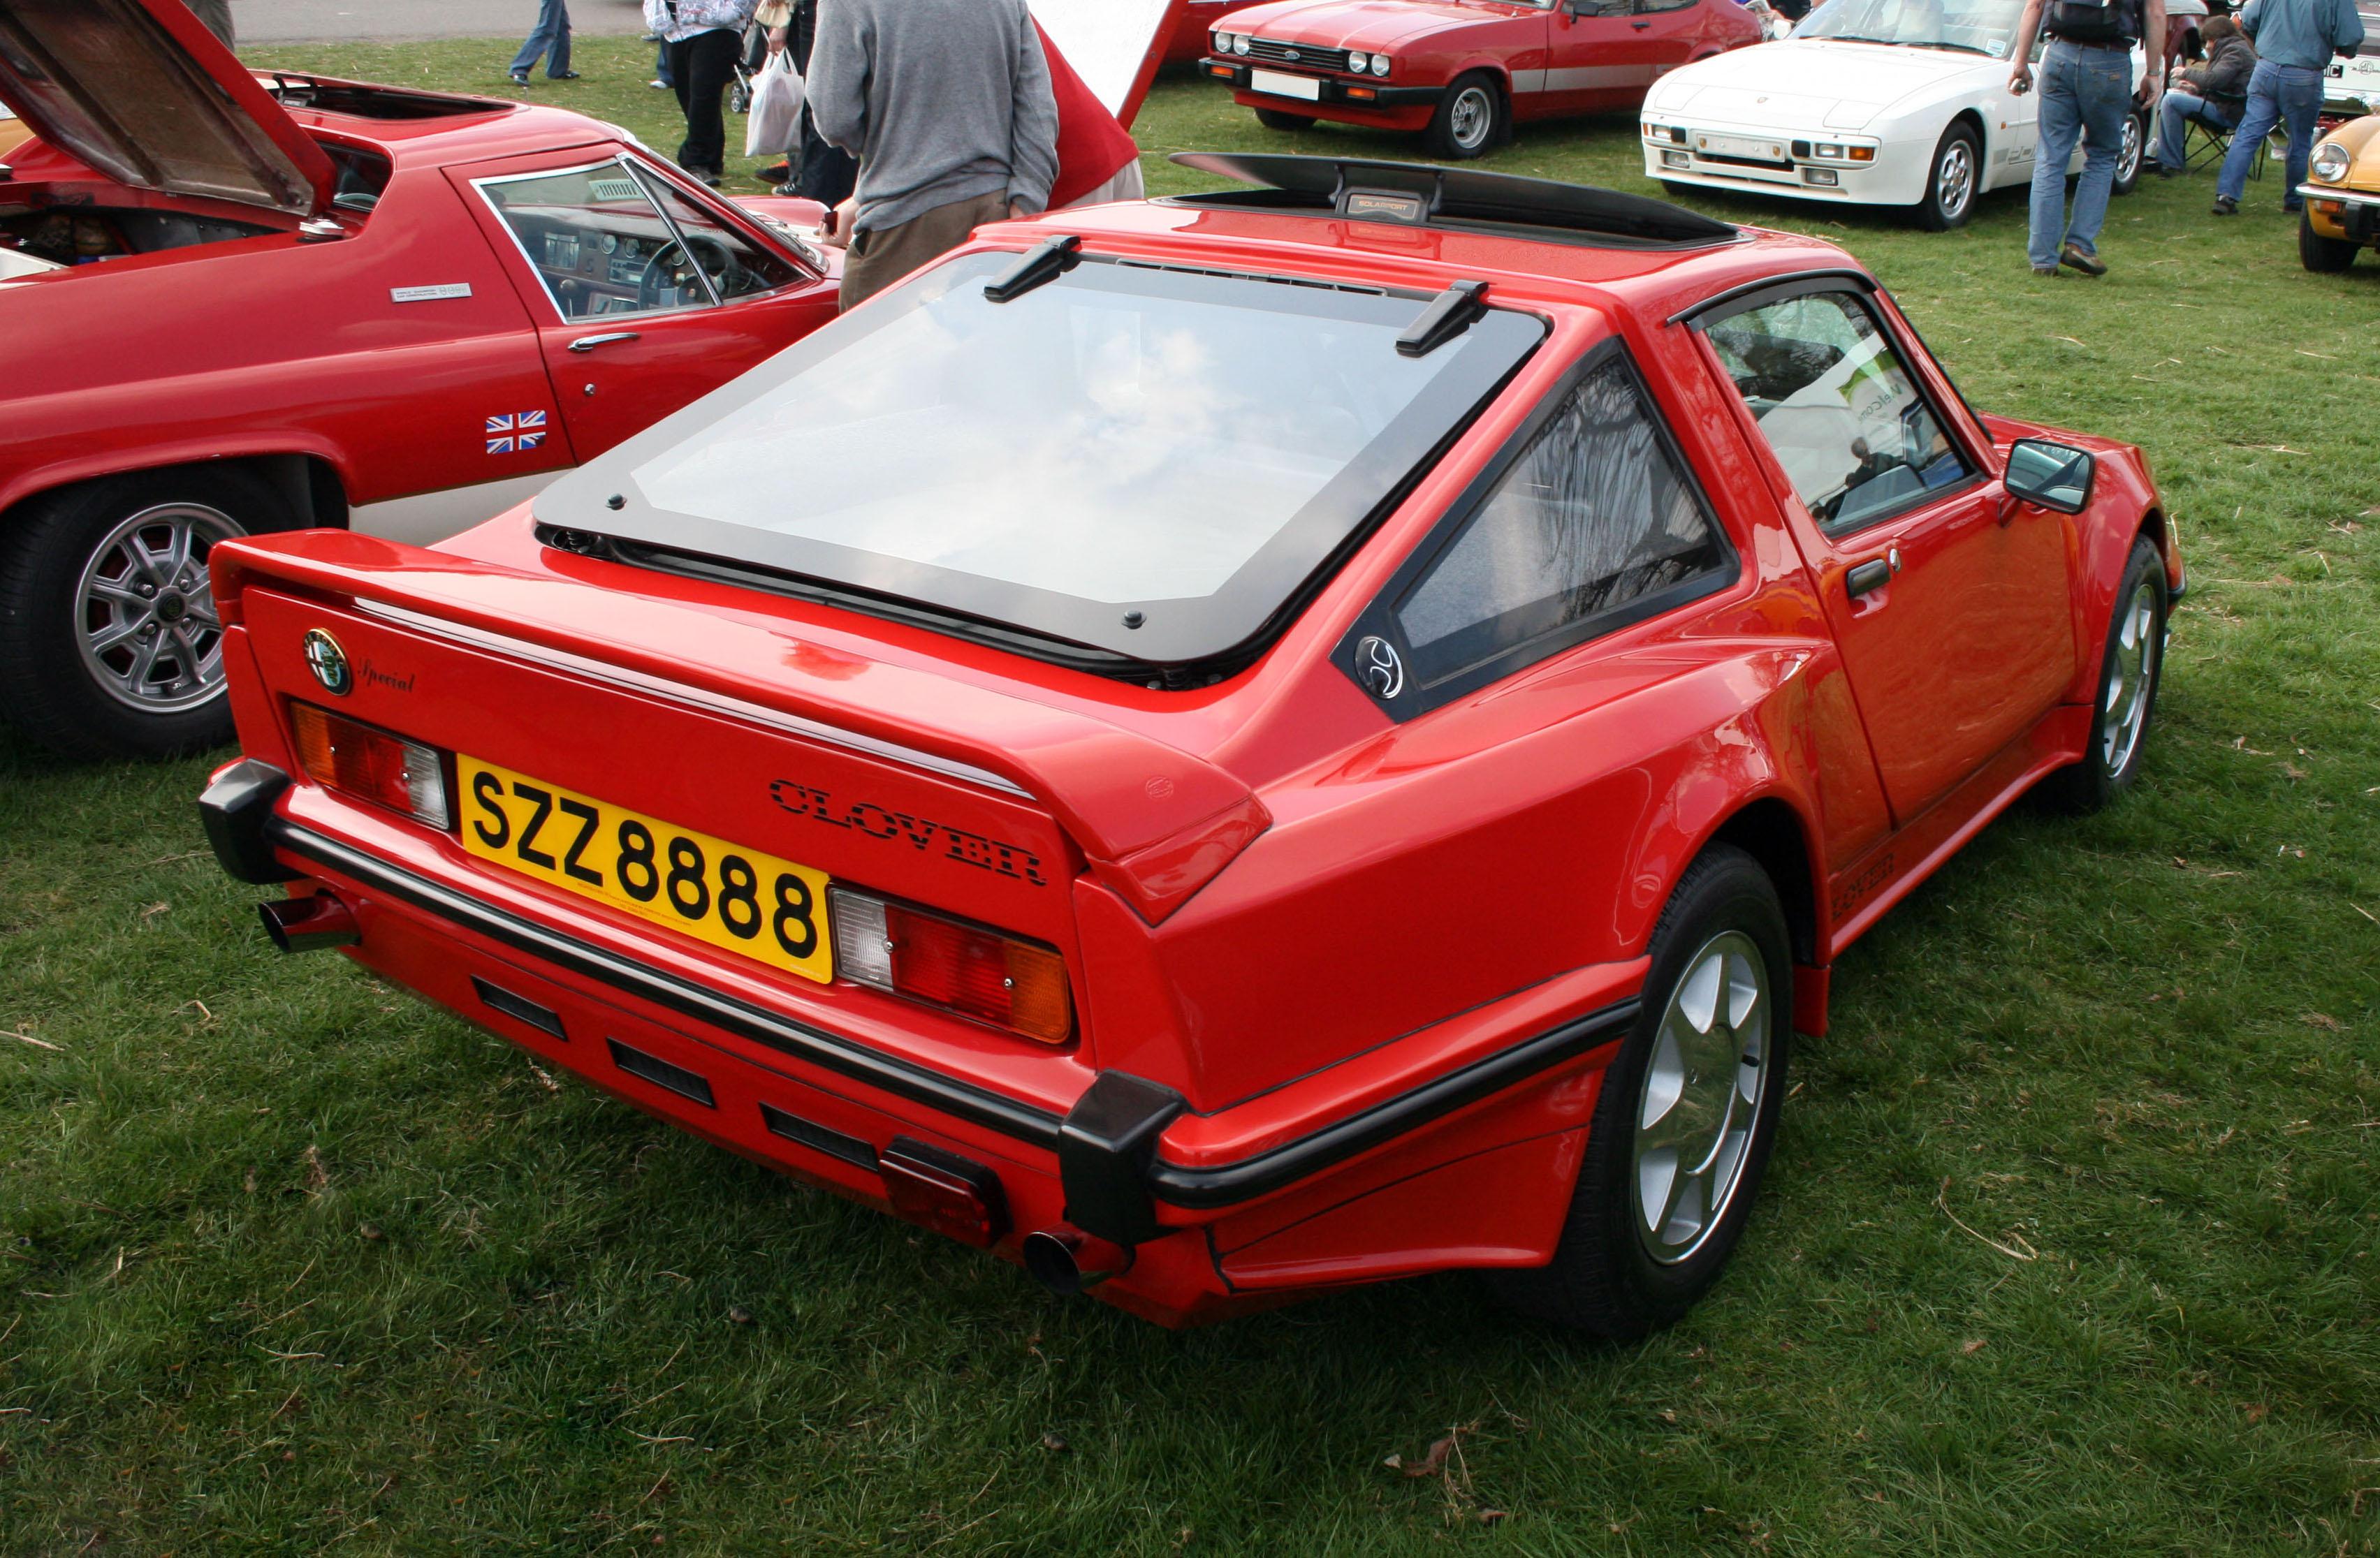 Alfa Romeo Wiki >> File:Clan Clover rv.jpg - Wikimedia Commons